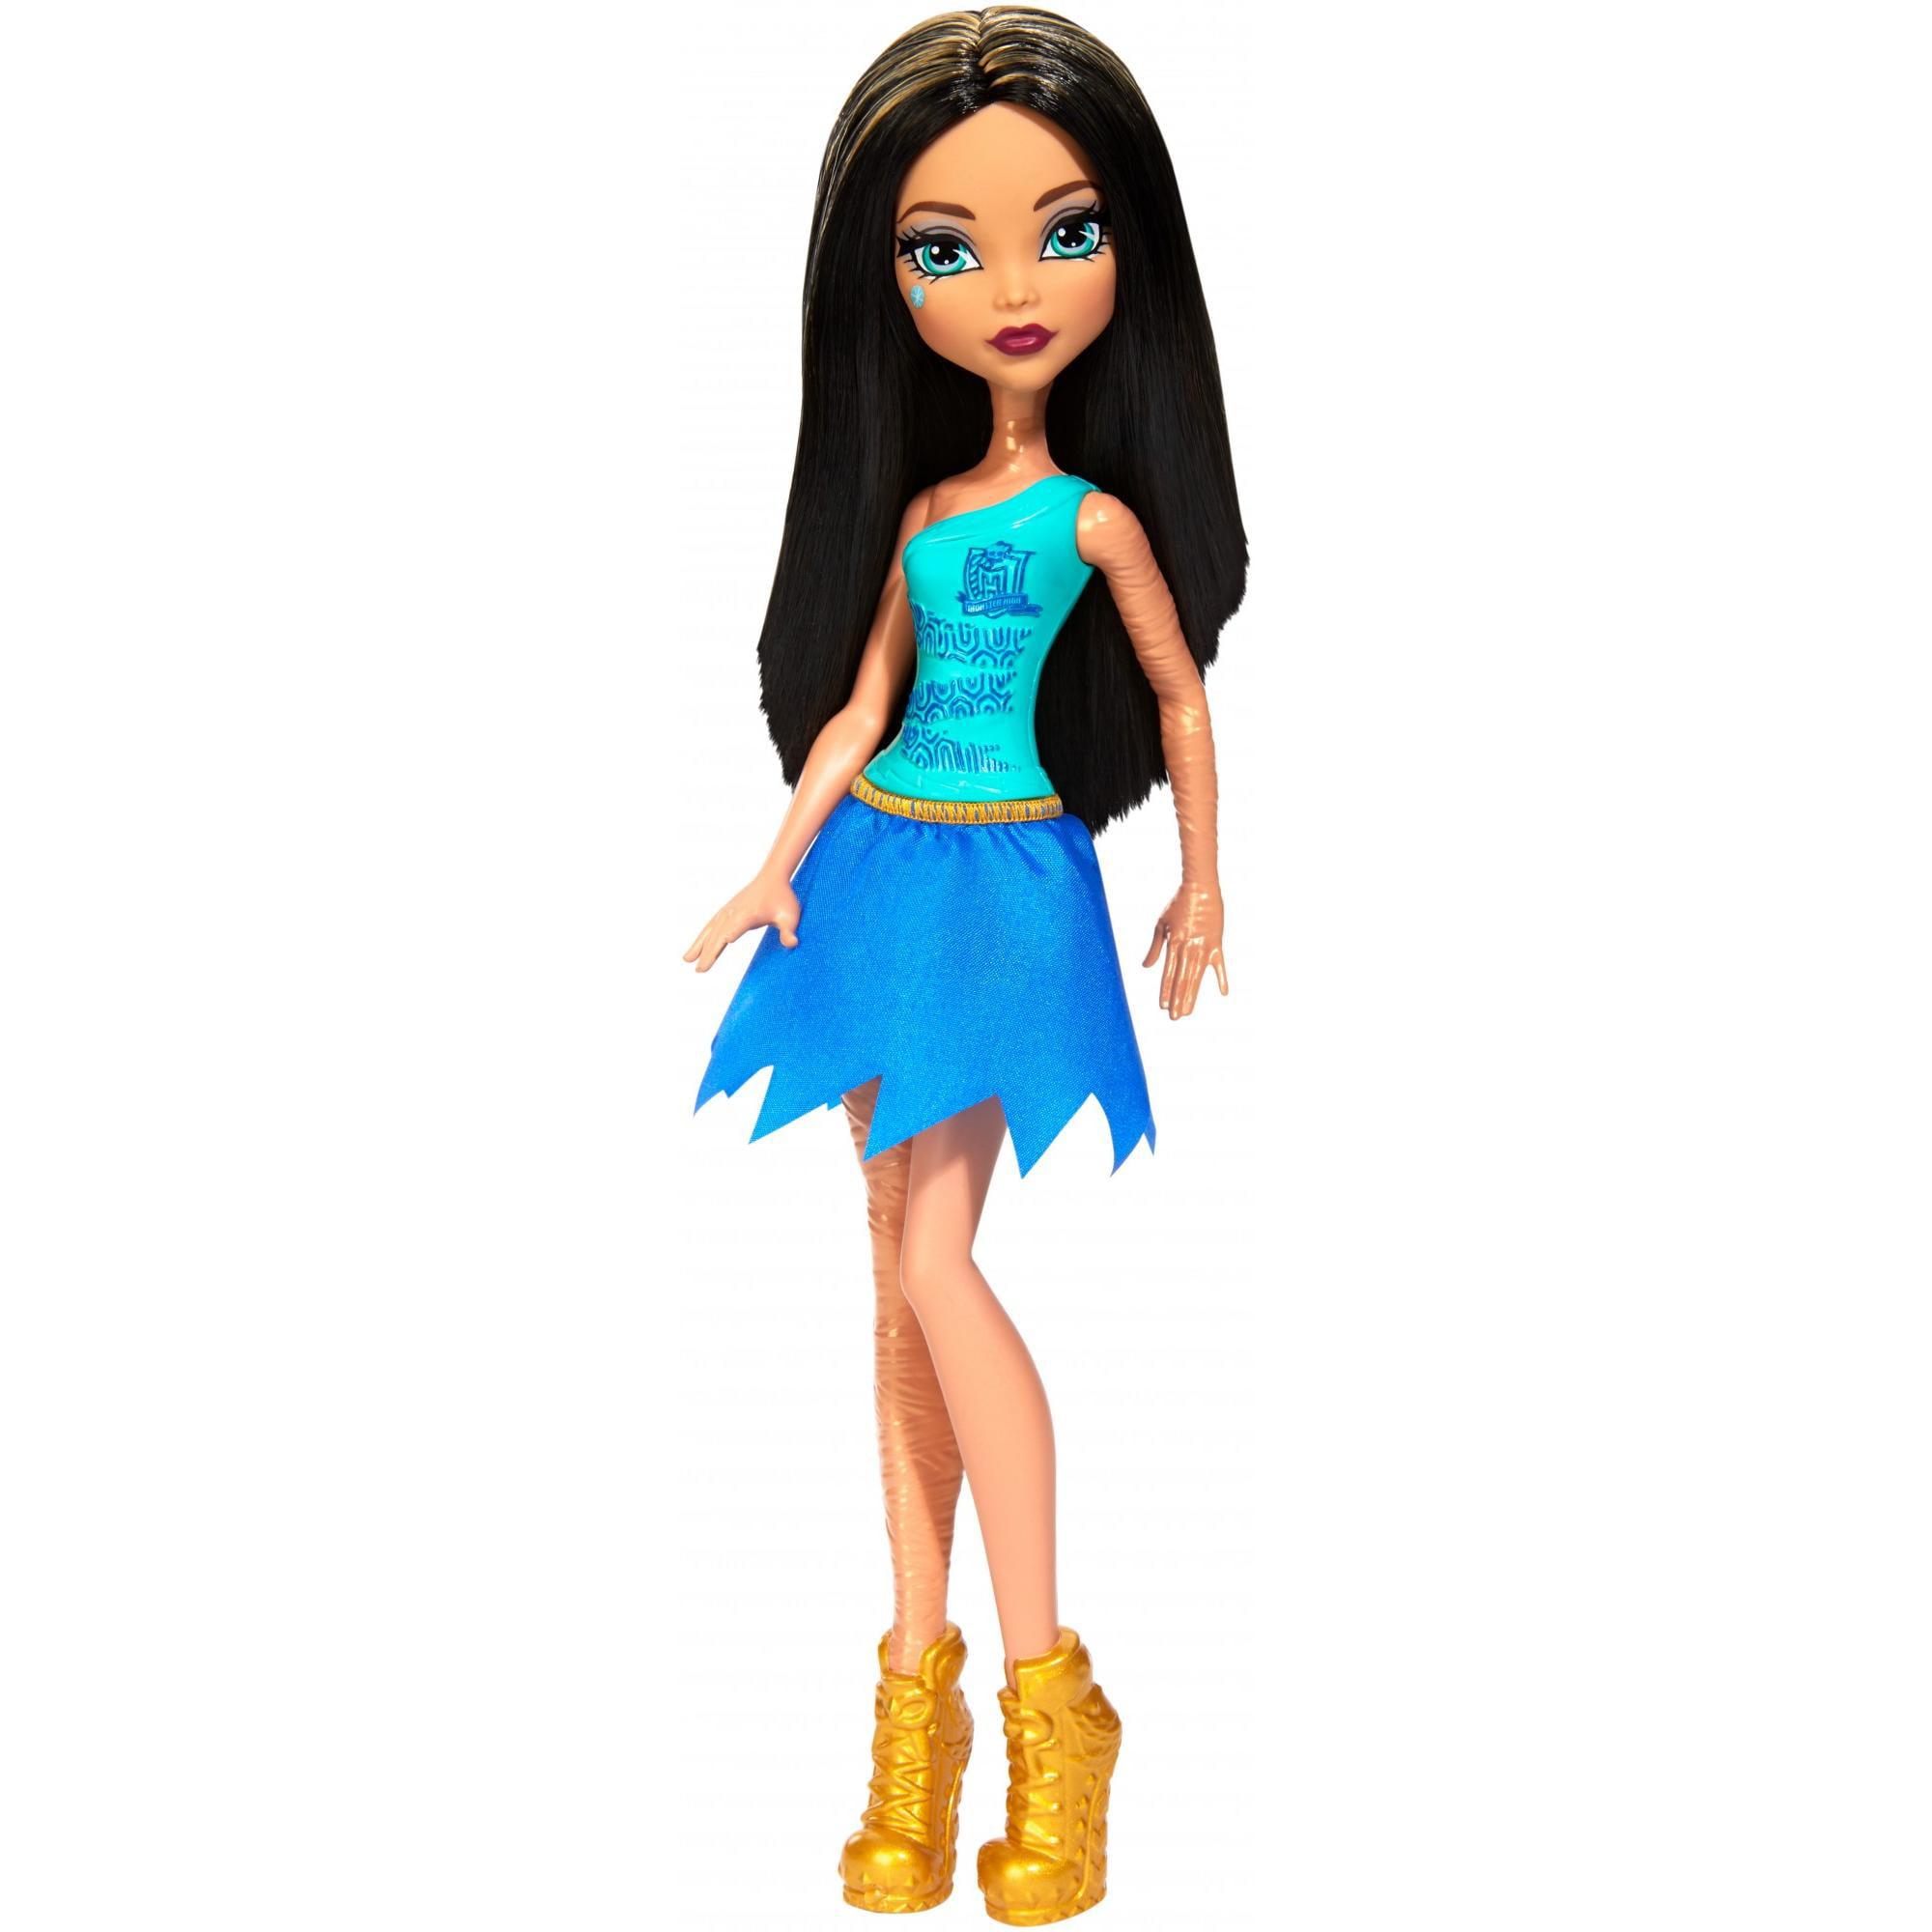 Monster High Cheerleader Cleo De Nile Doll by MATTEL INC.